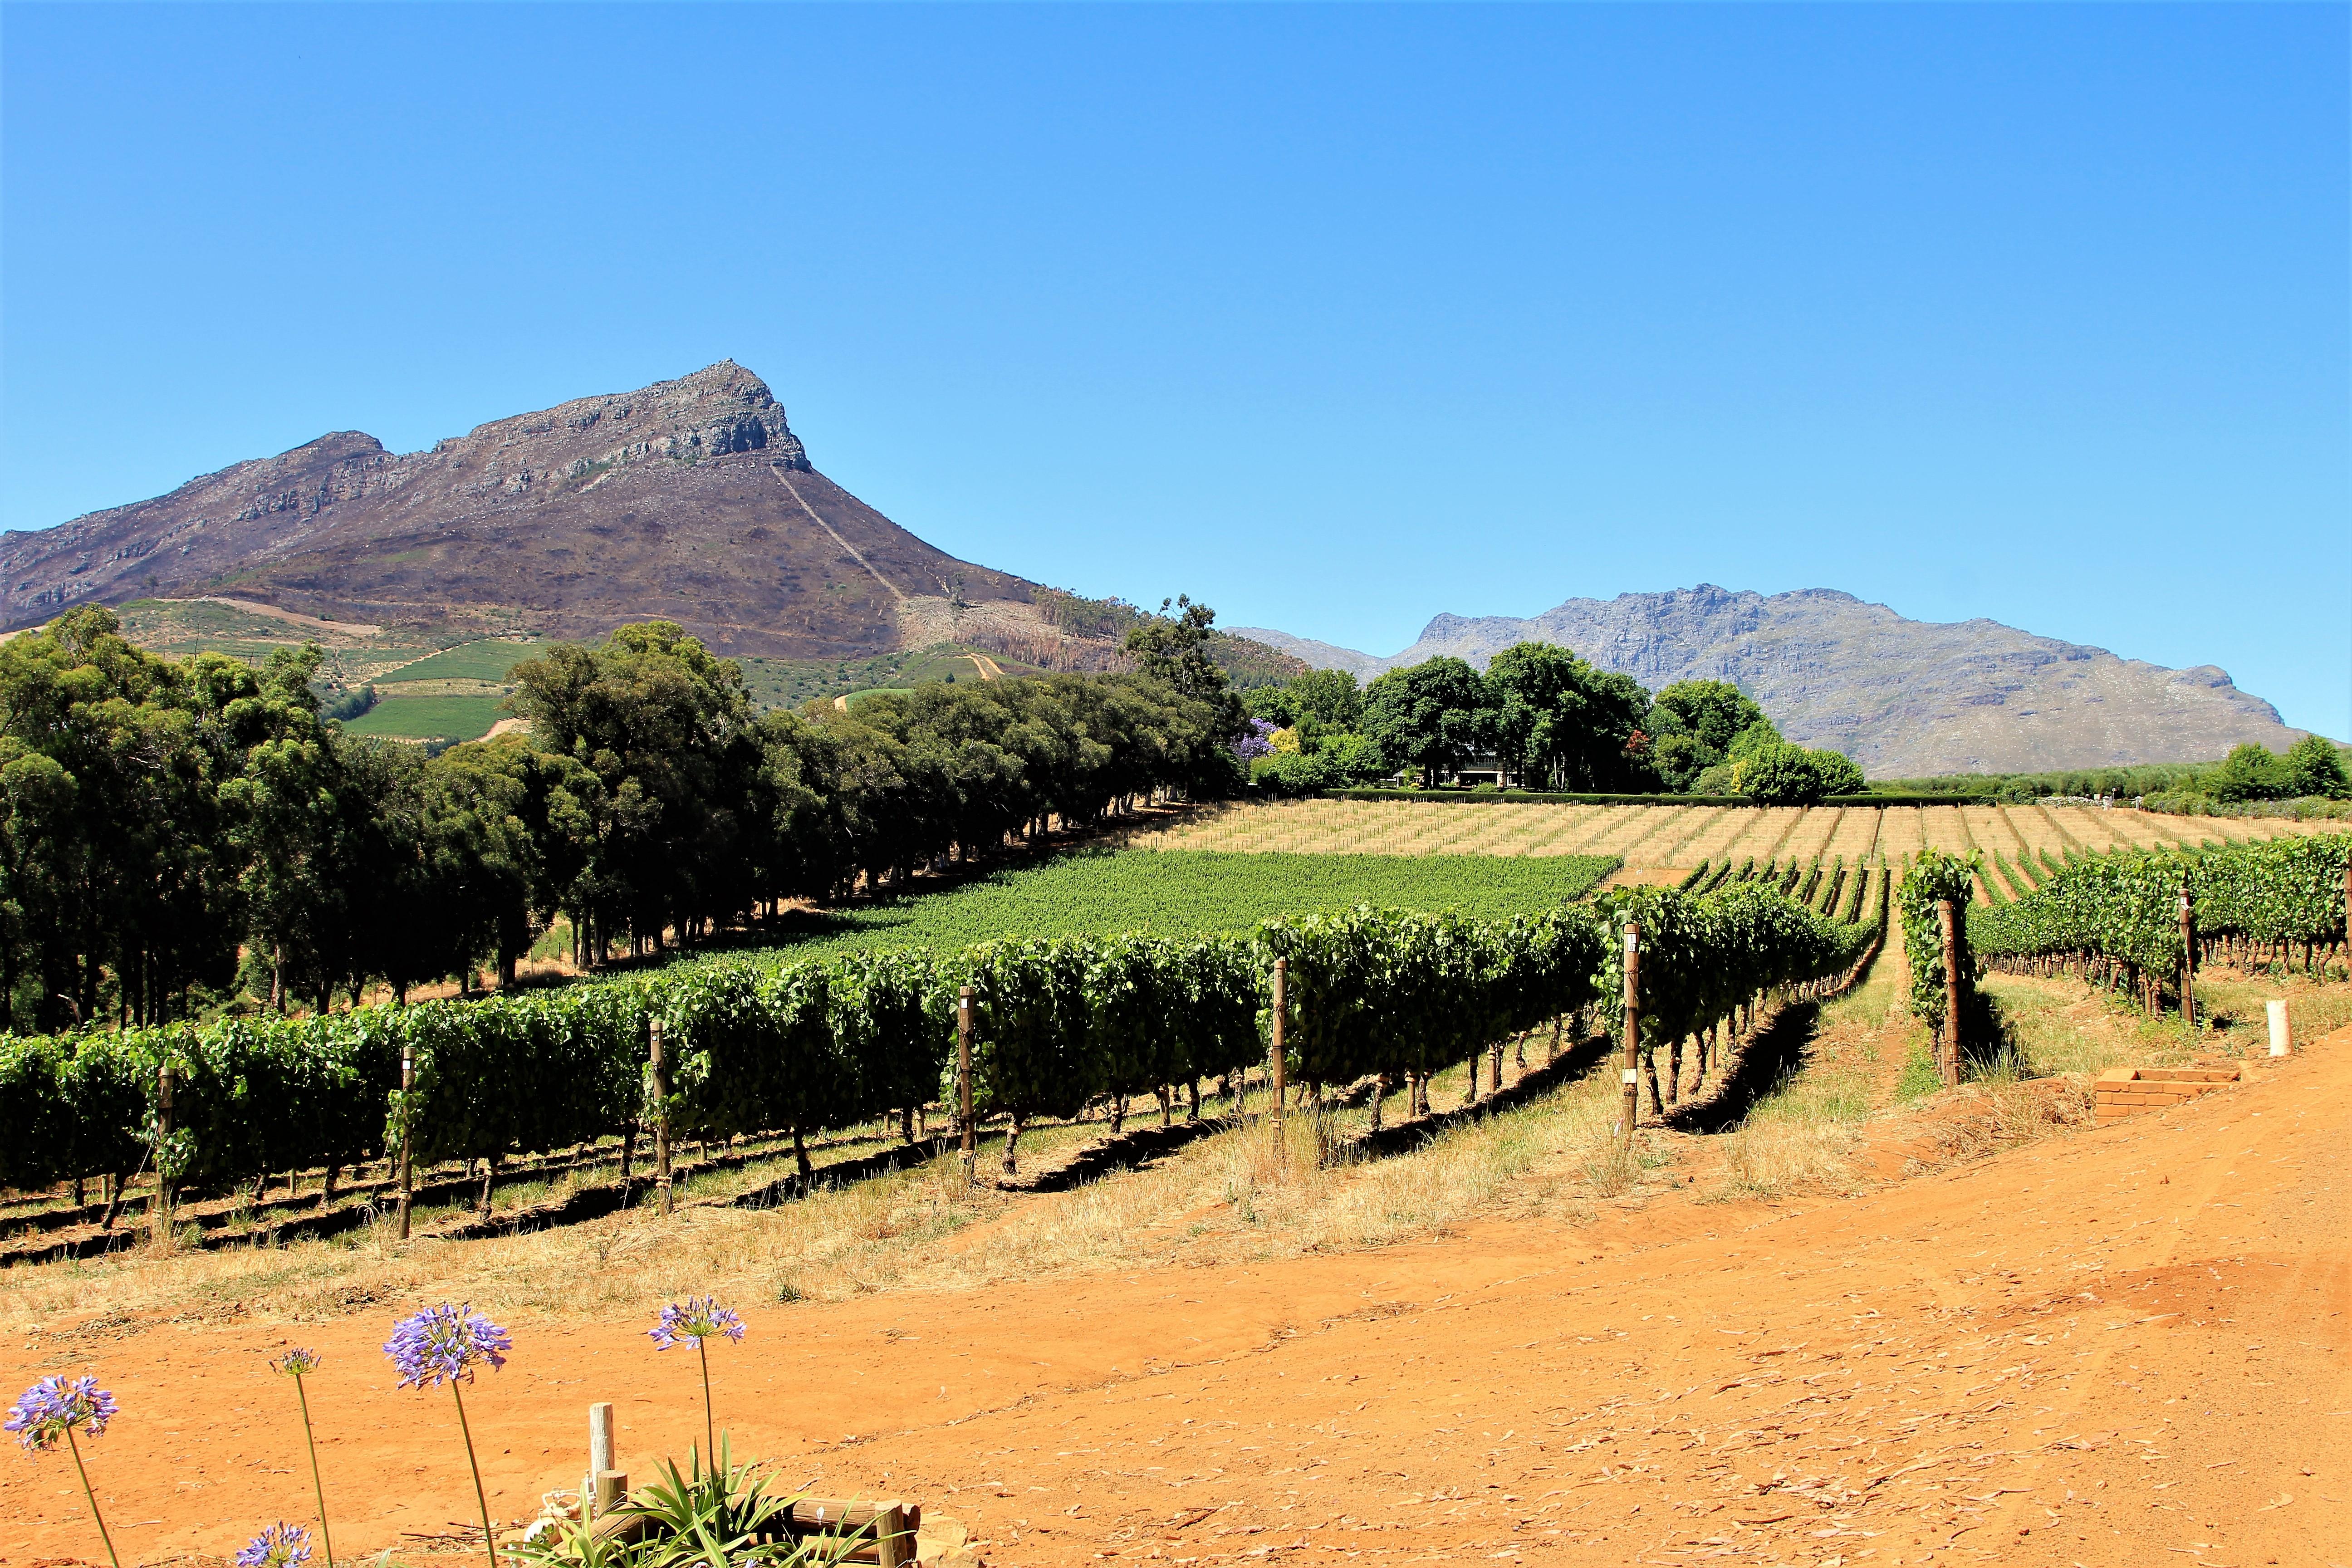 Thelema Vineyards